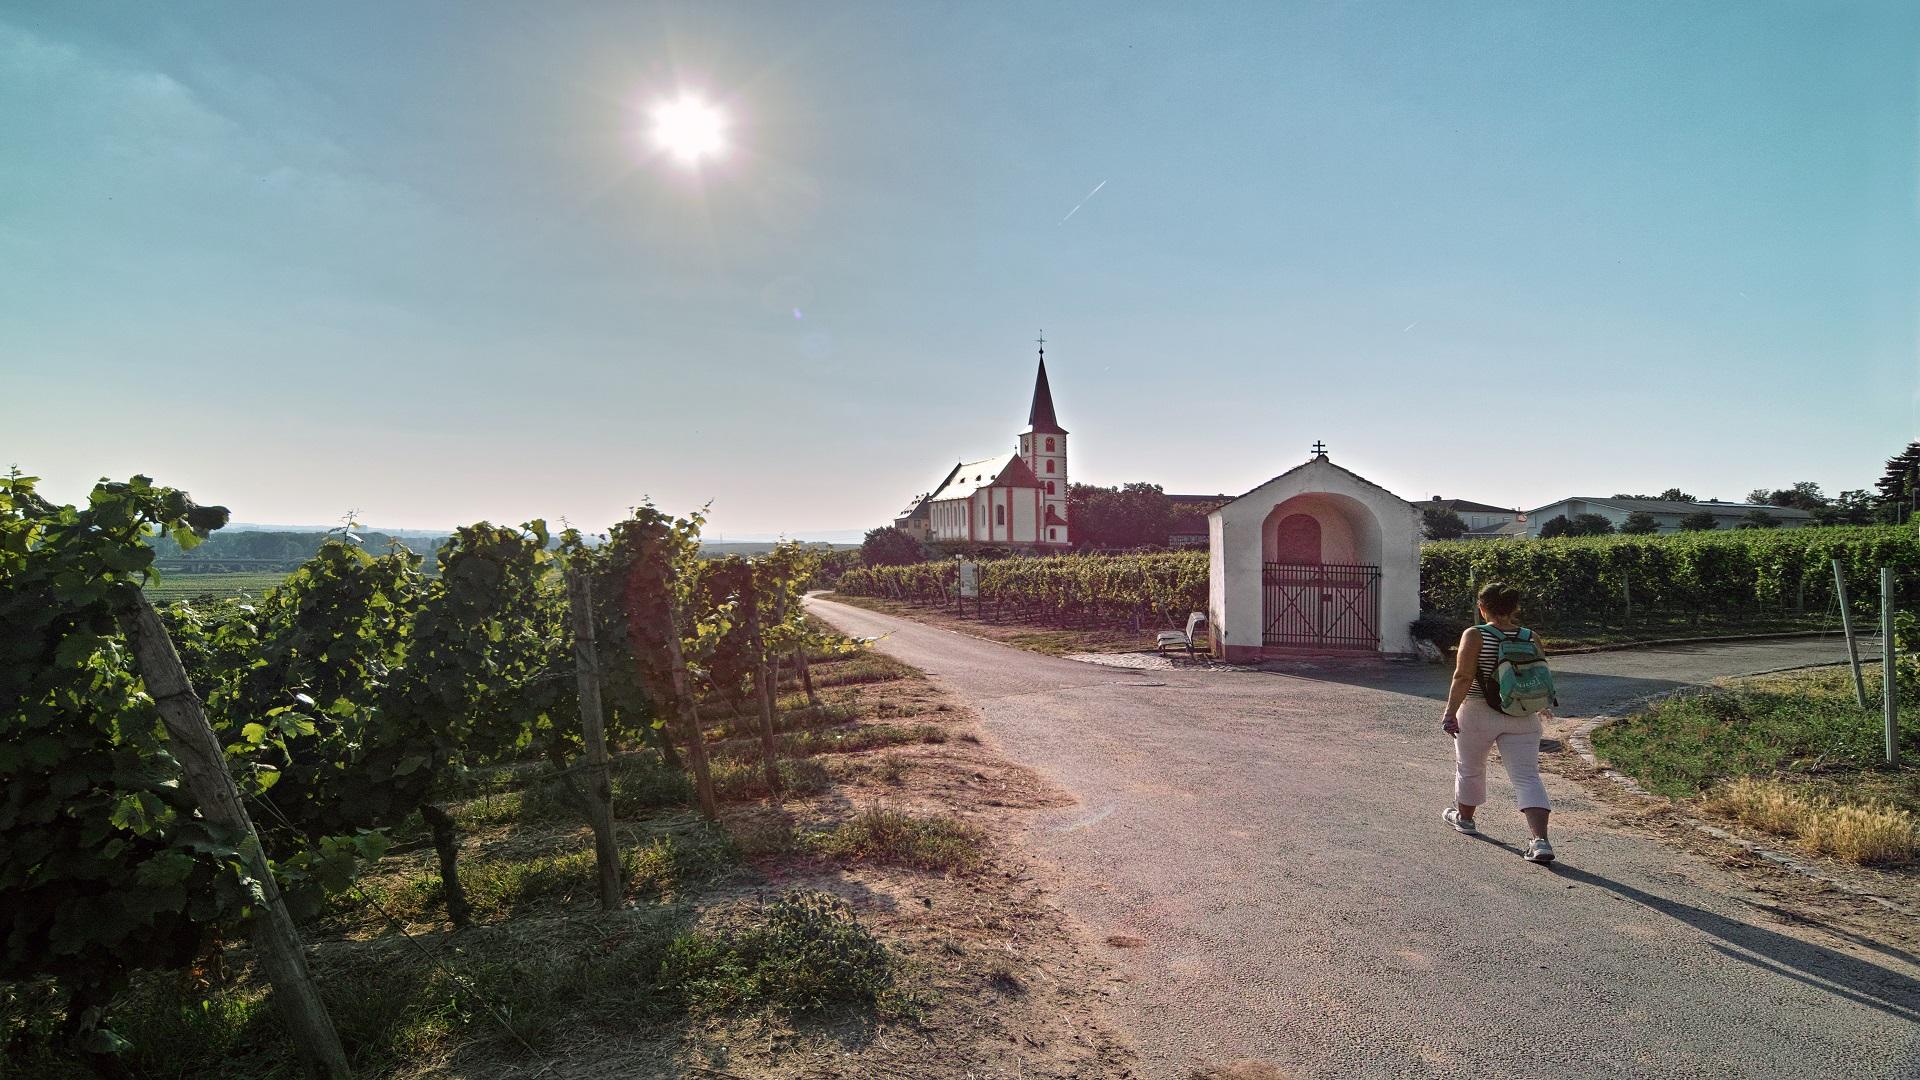 Main-Taunus-Kreis - Kath. Pfarrkirche St. Peter und Paul in Hochheim am Main